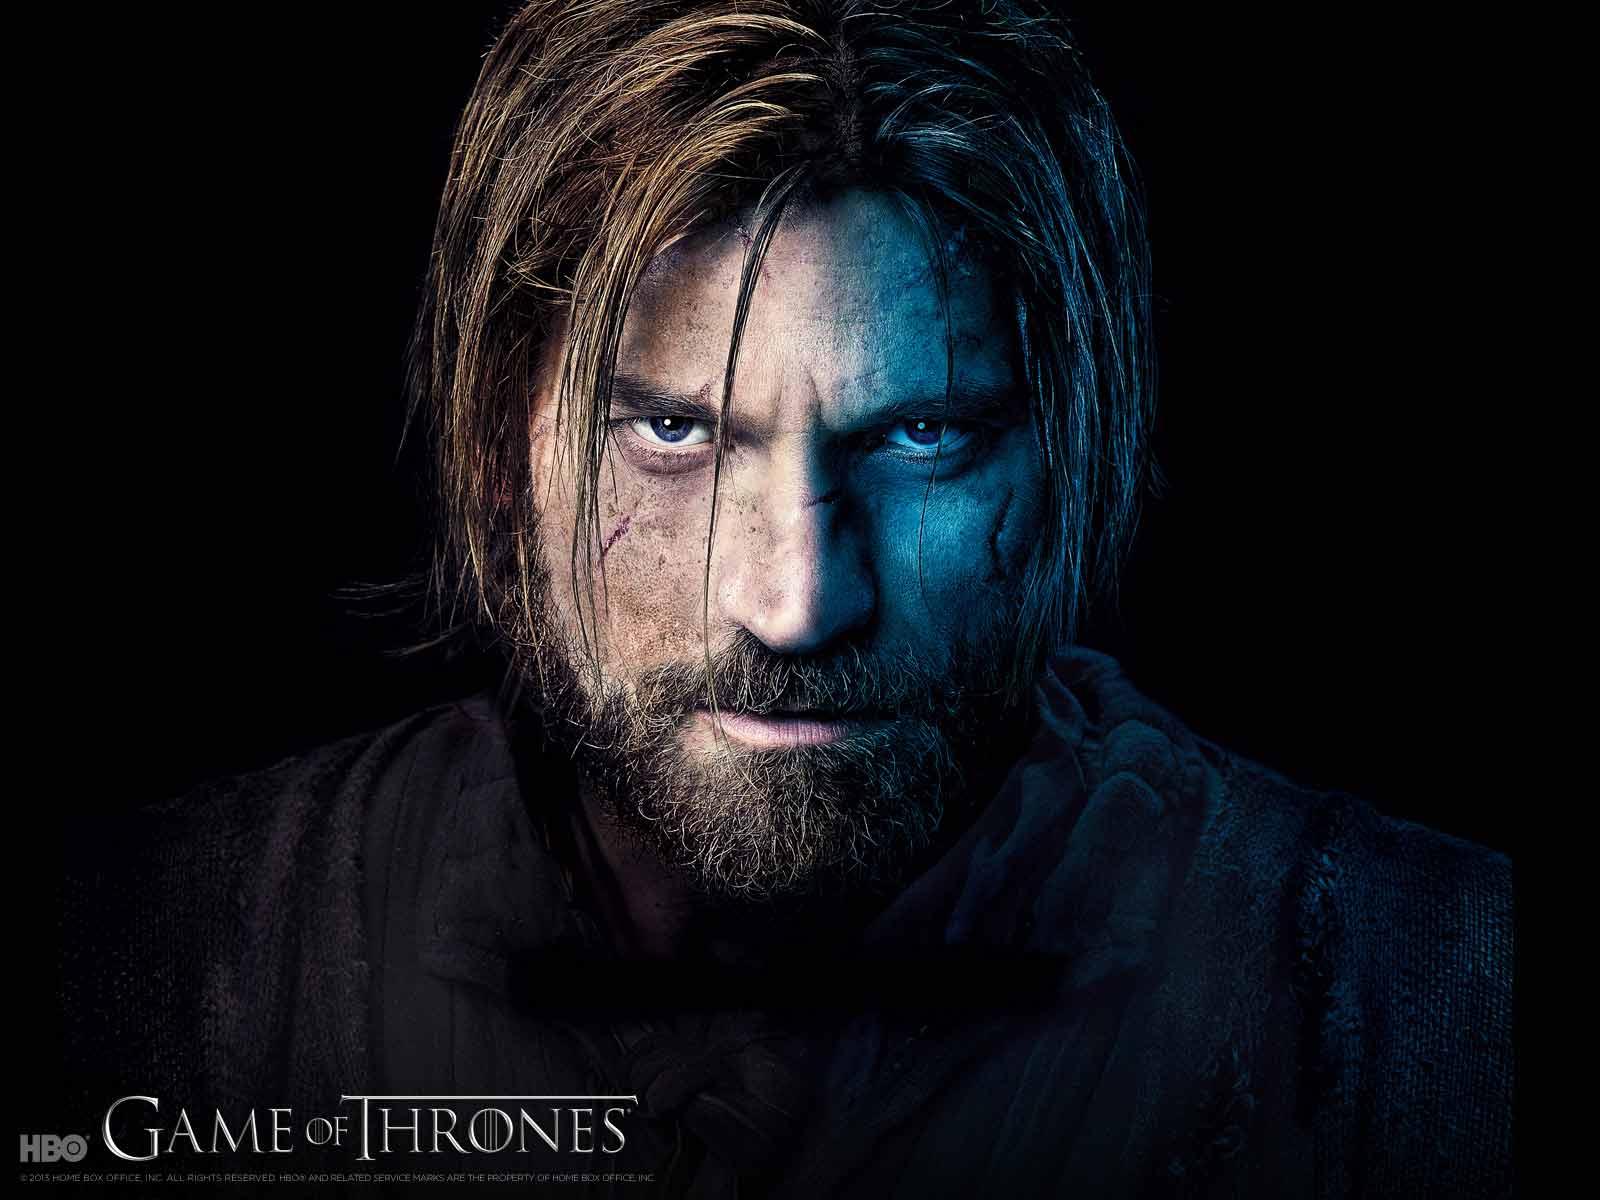 Game of thrones season 4 wallpaper jaime hd wallpaper facebook trending blogs voltagebd Images